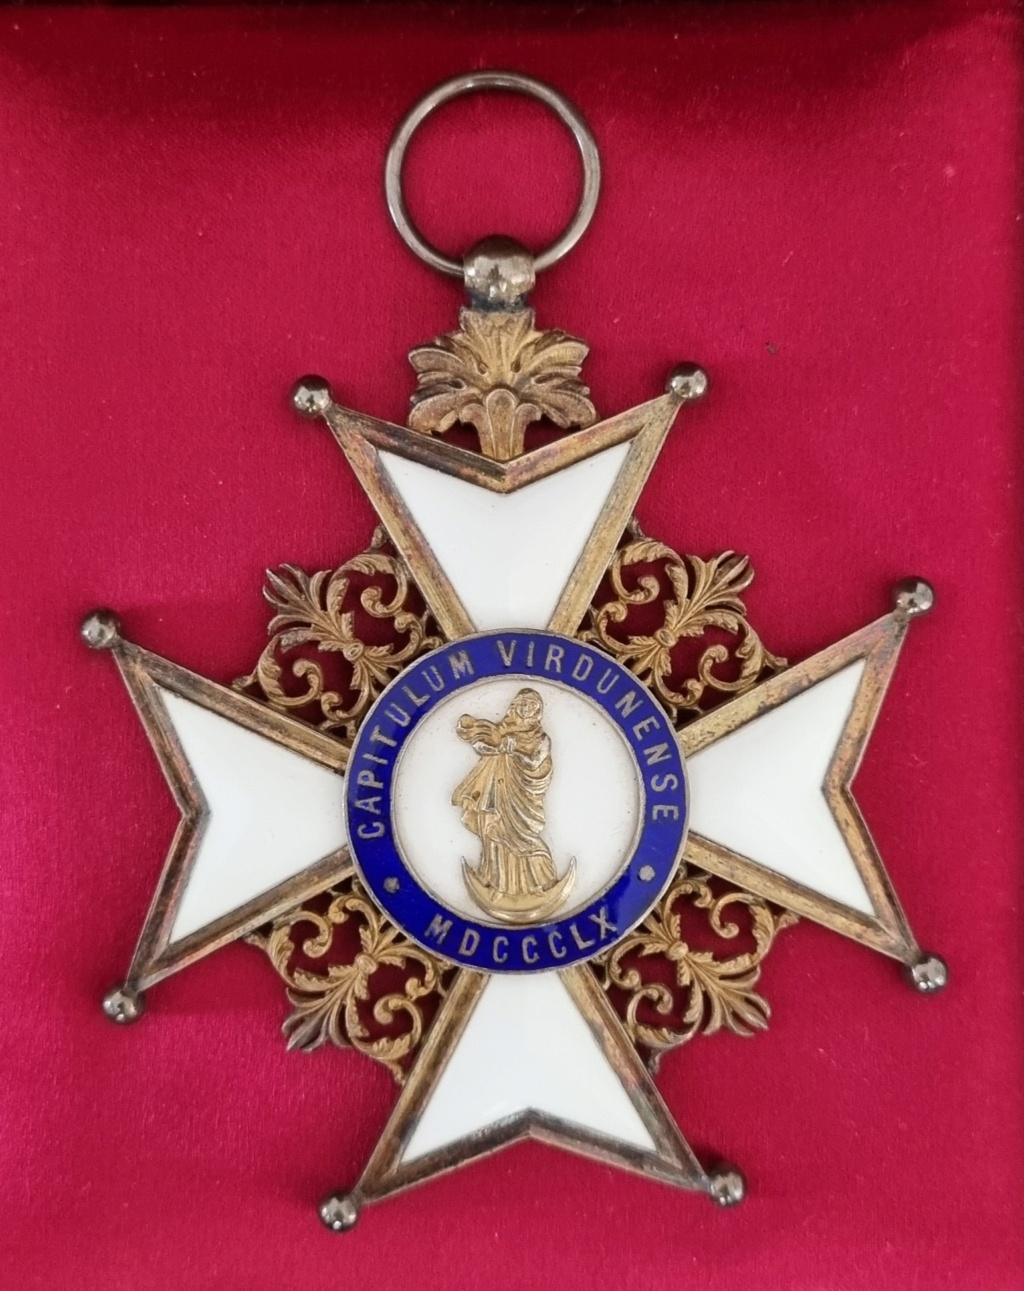 Médaille à identifier - Merci d'avance  20210517